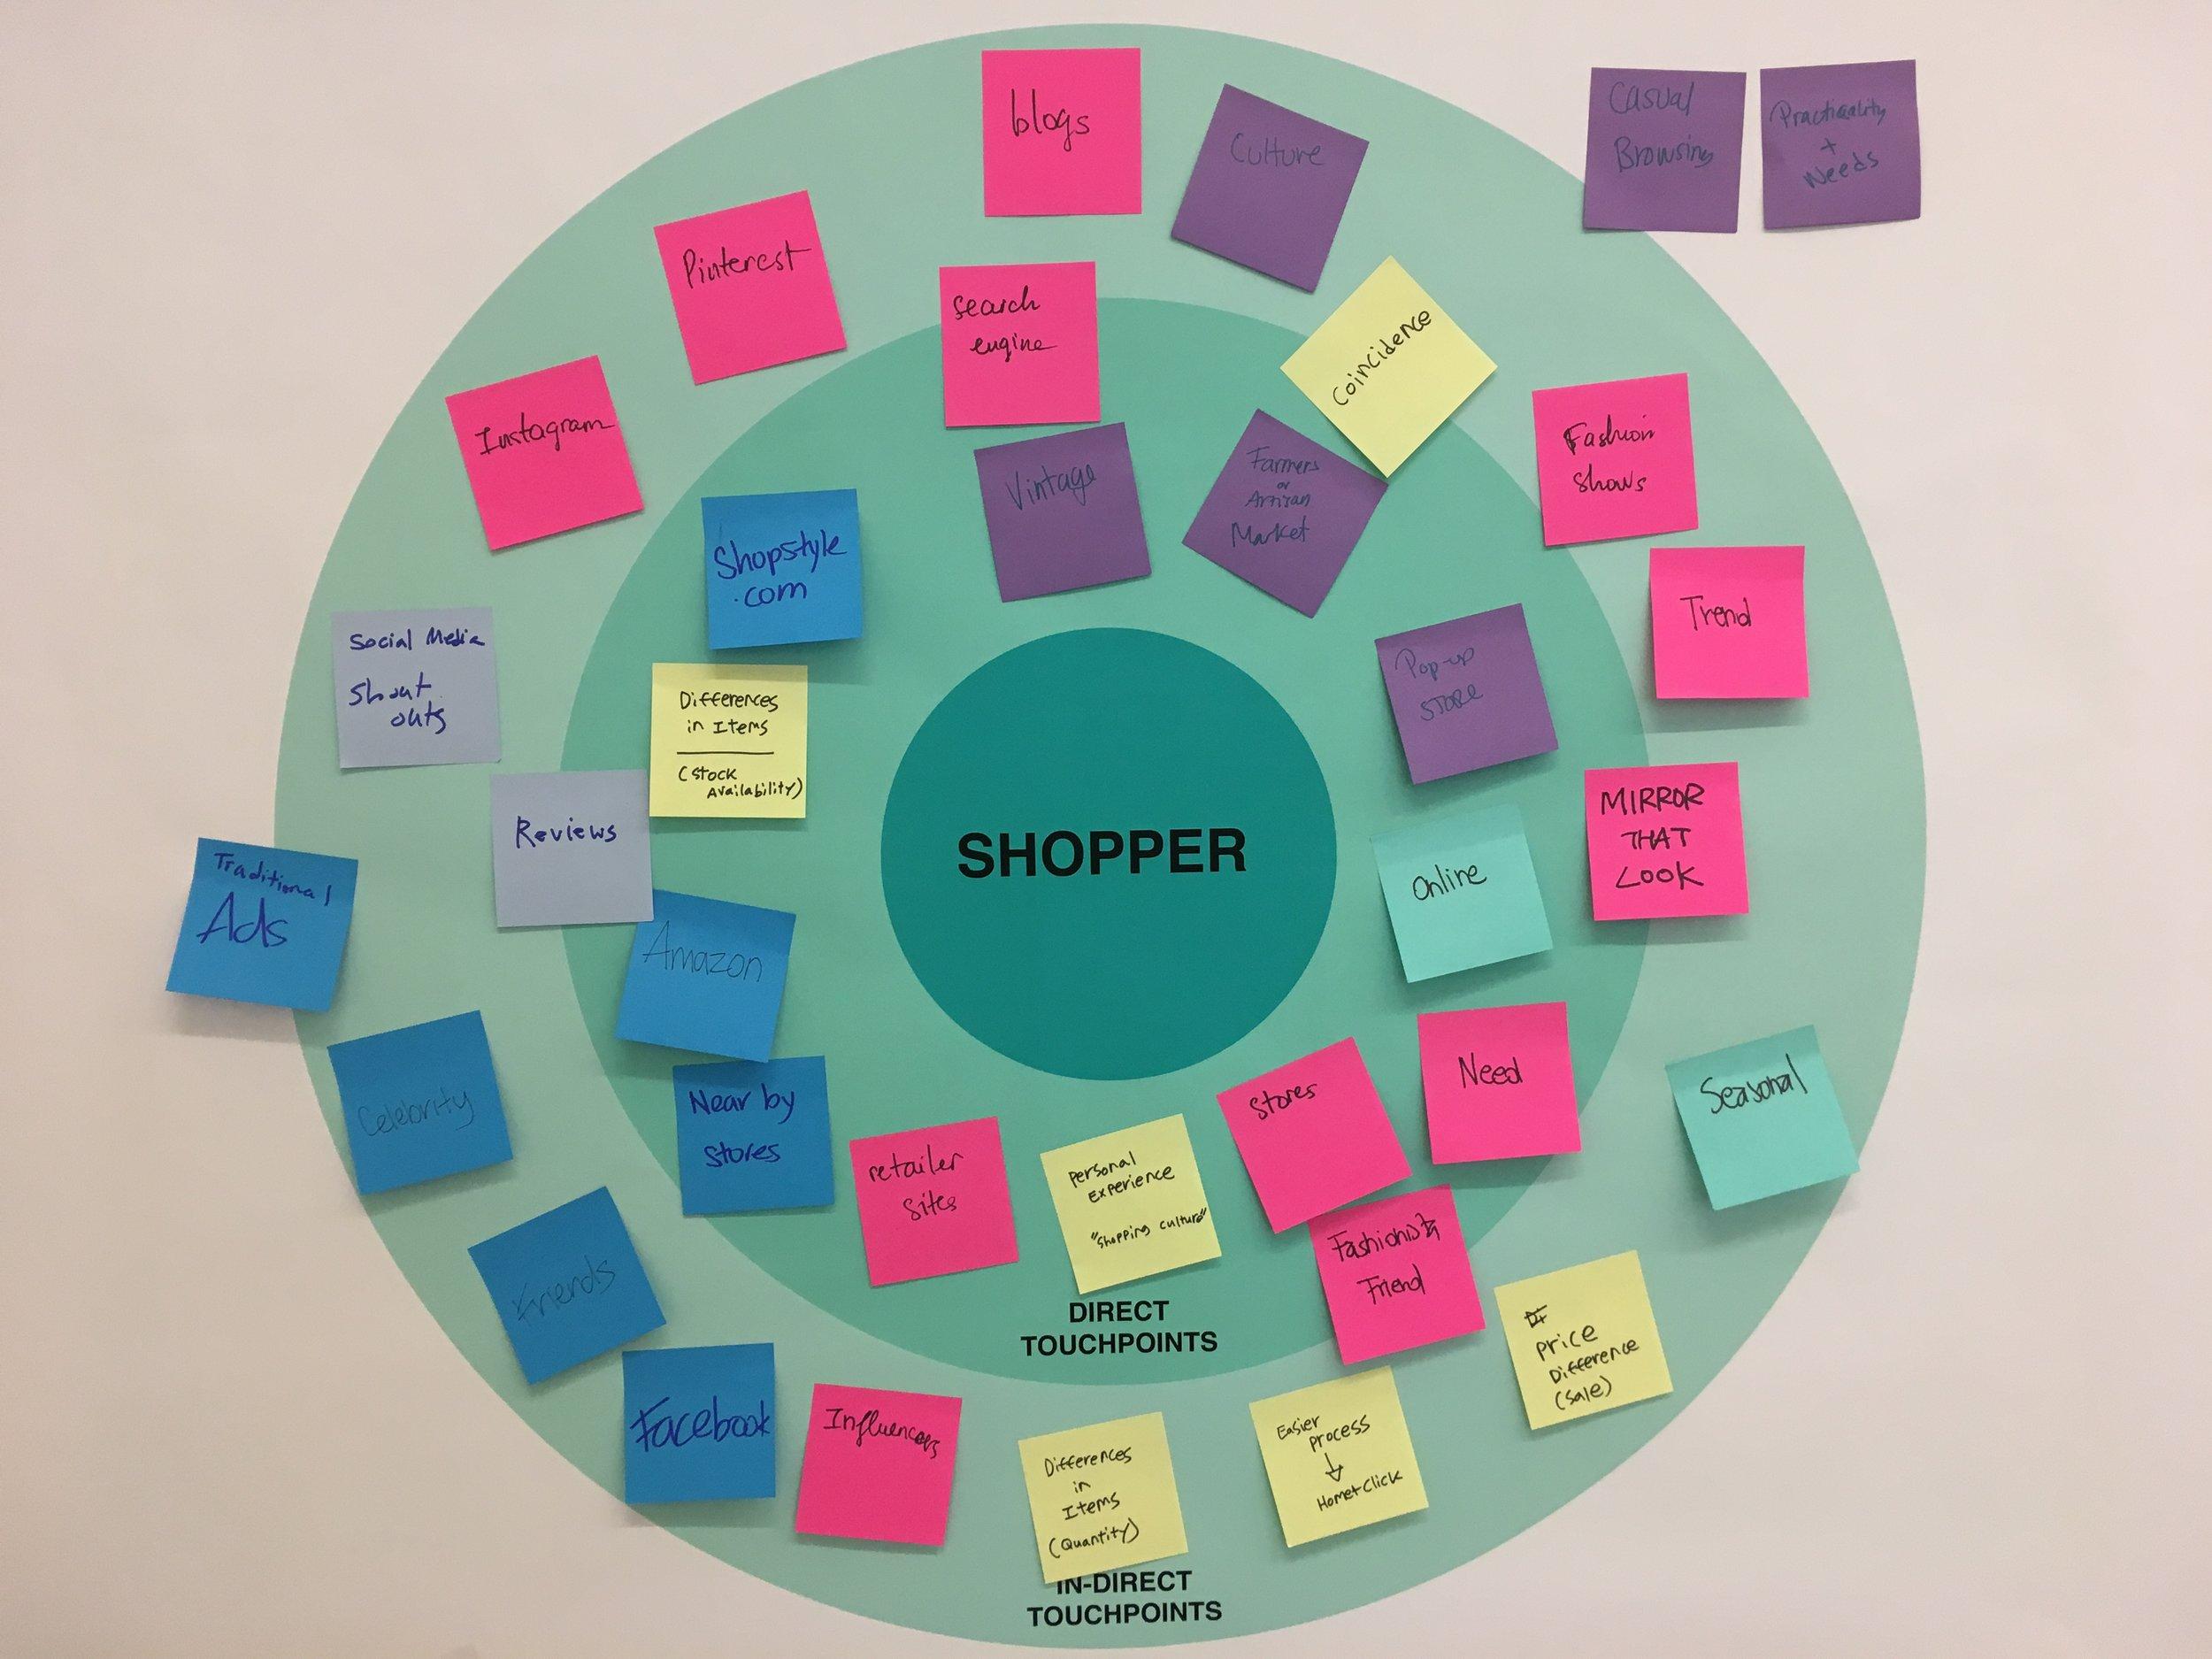 Ecosystem - Shopper.jpg